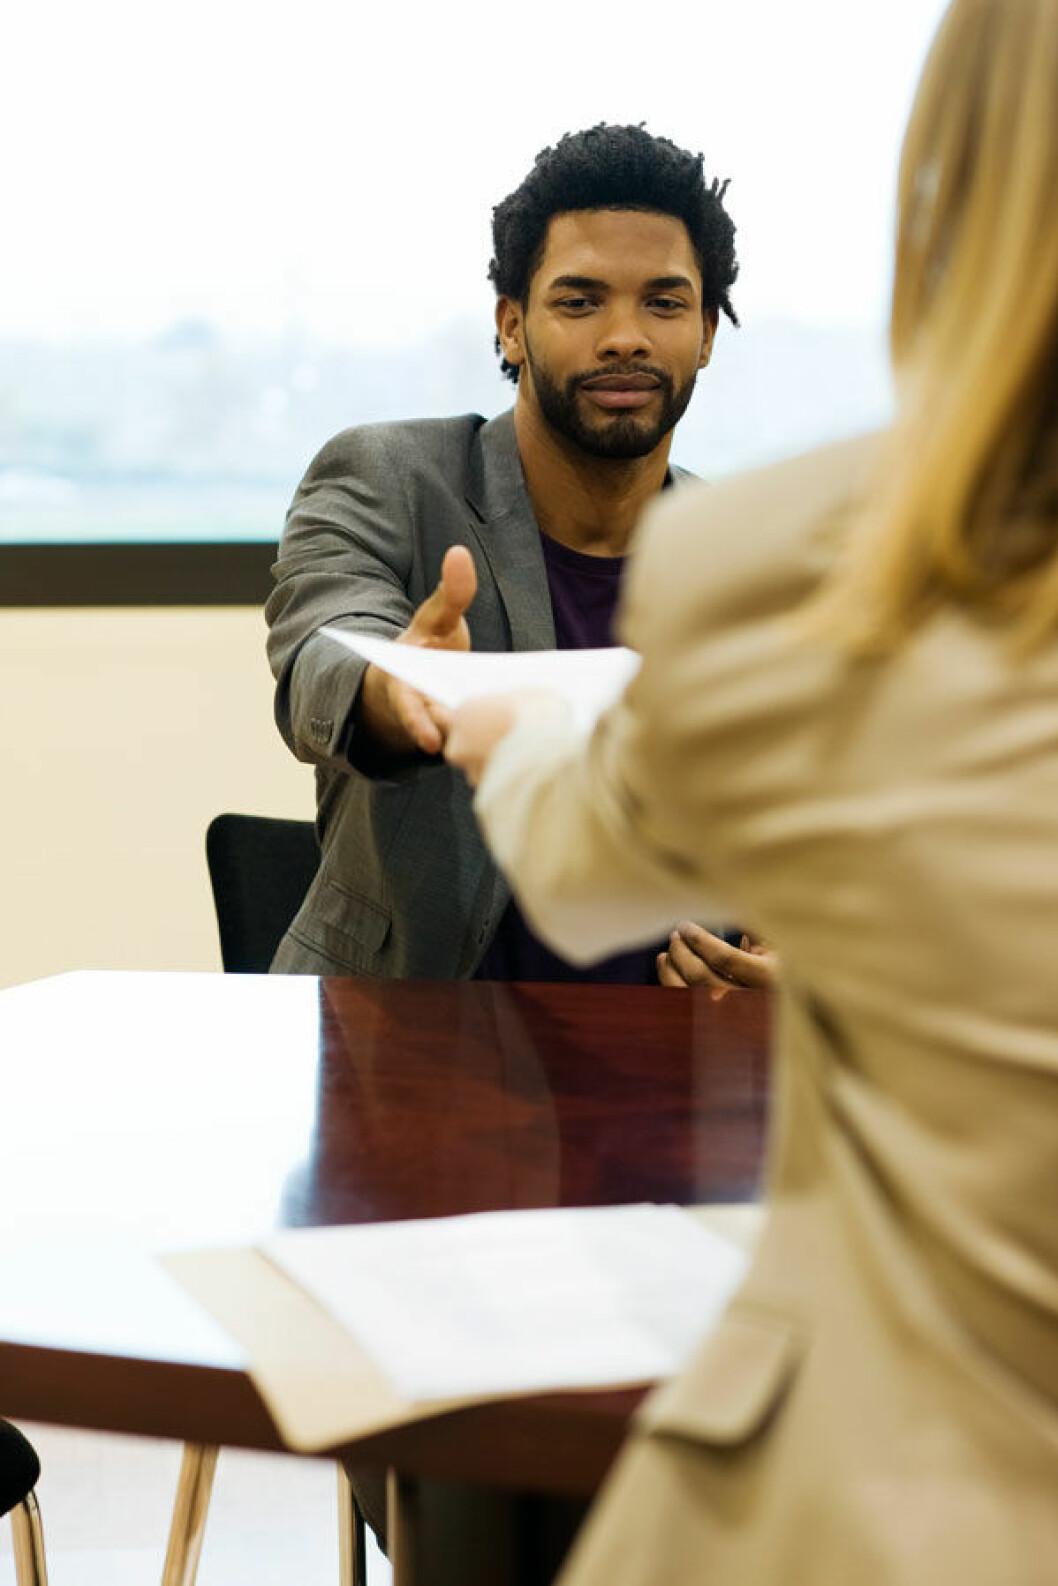 Jobbintervju-bord